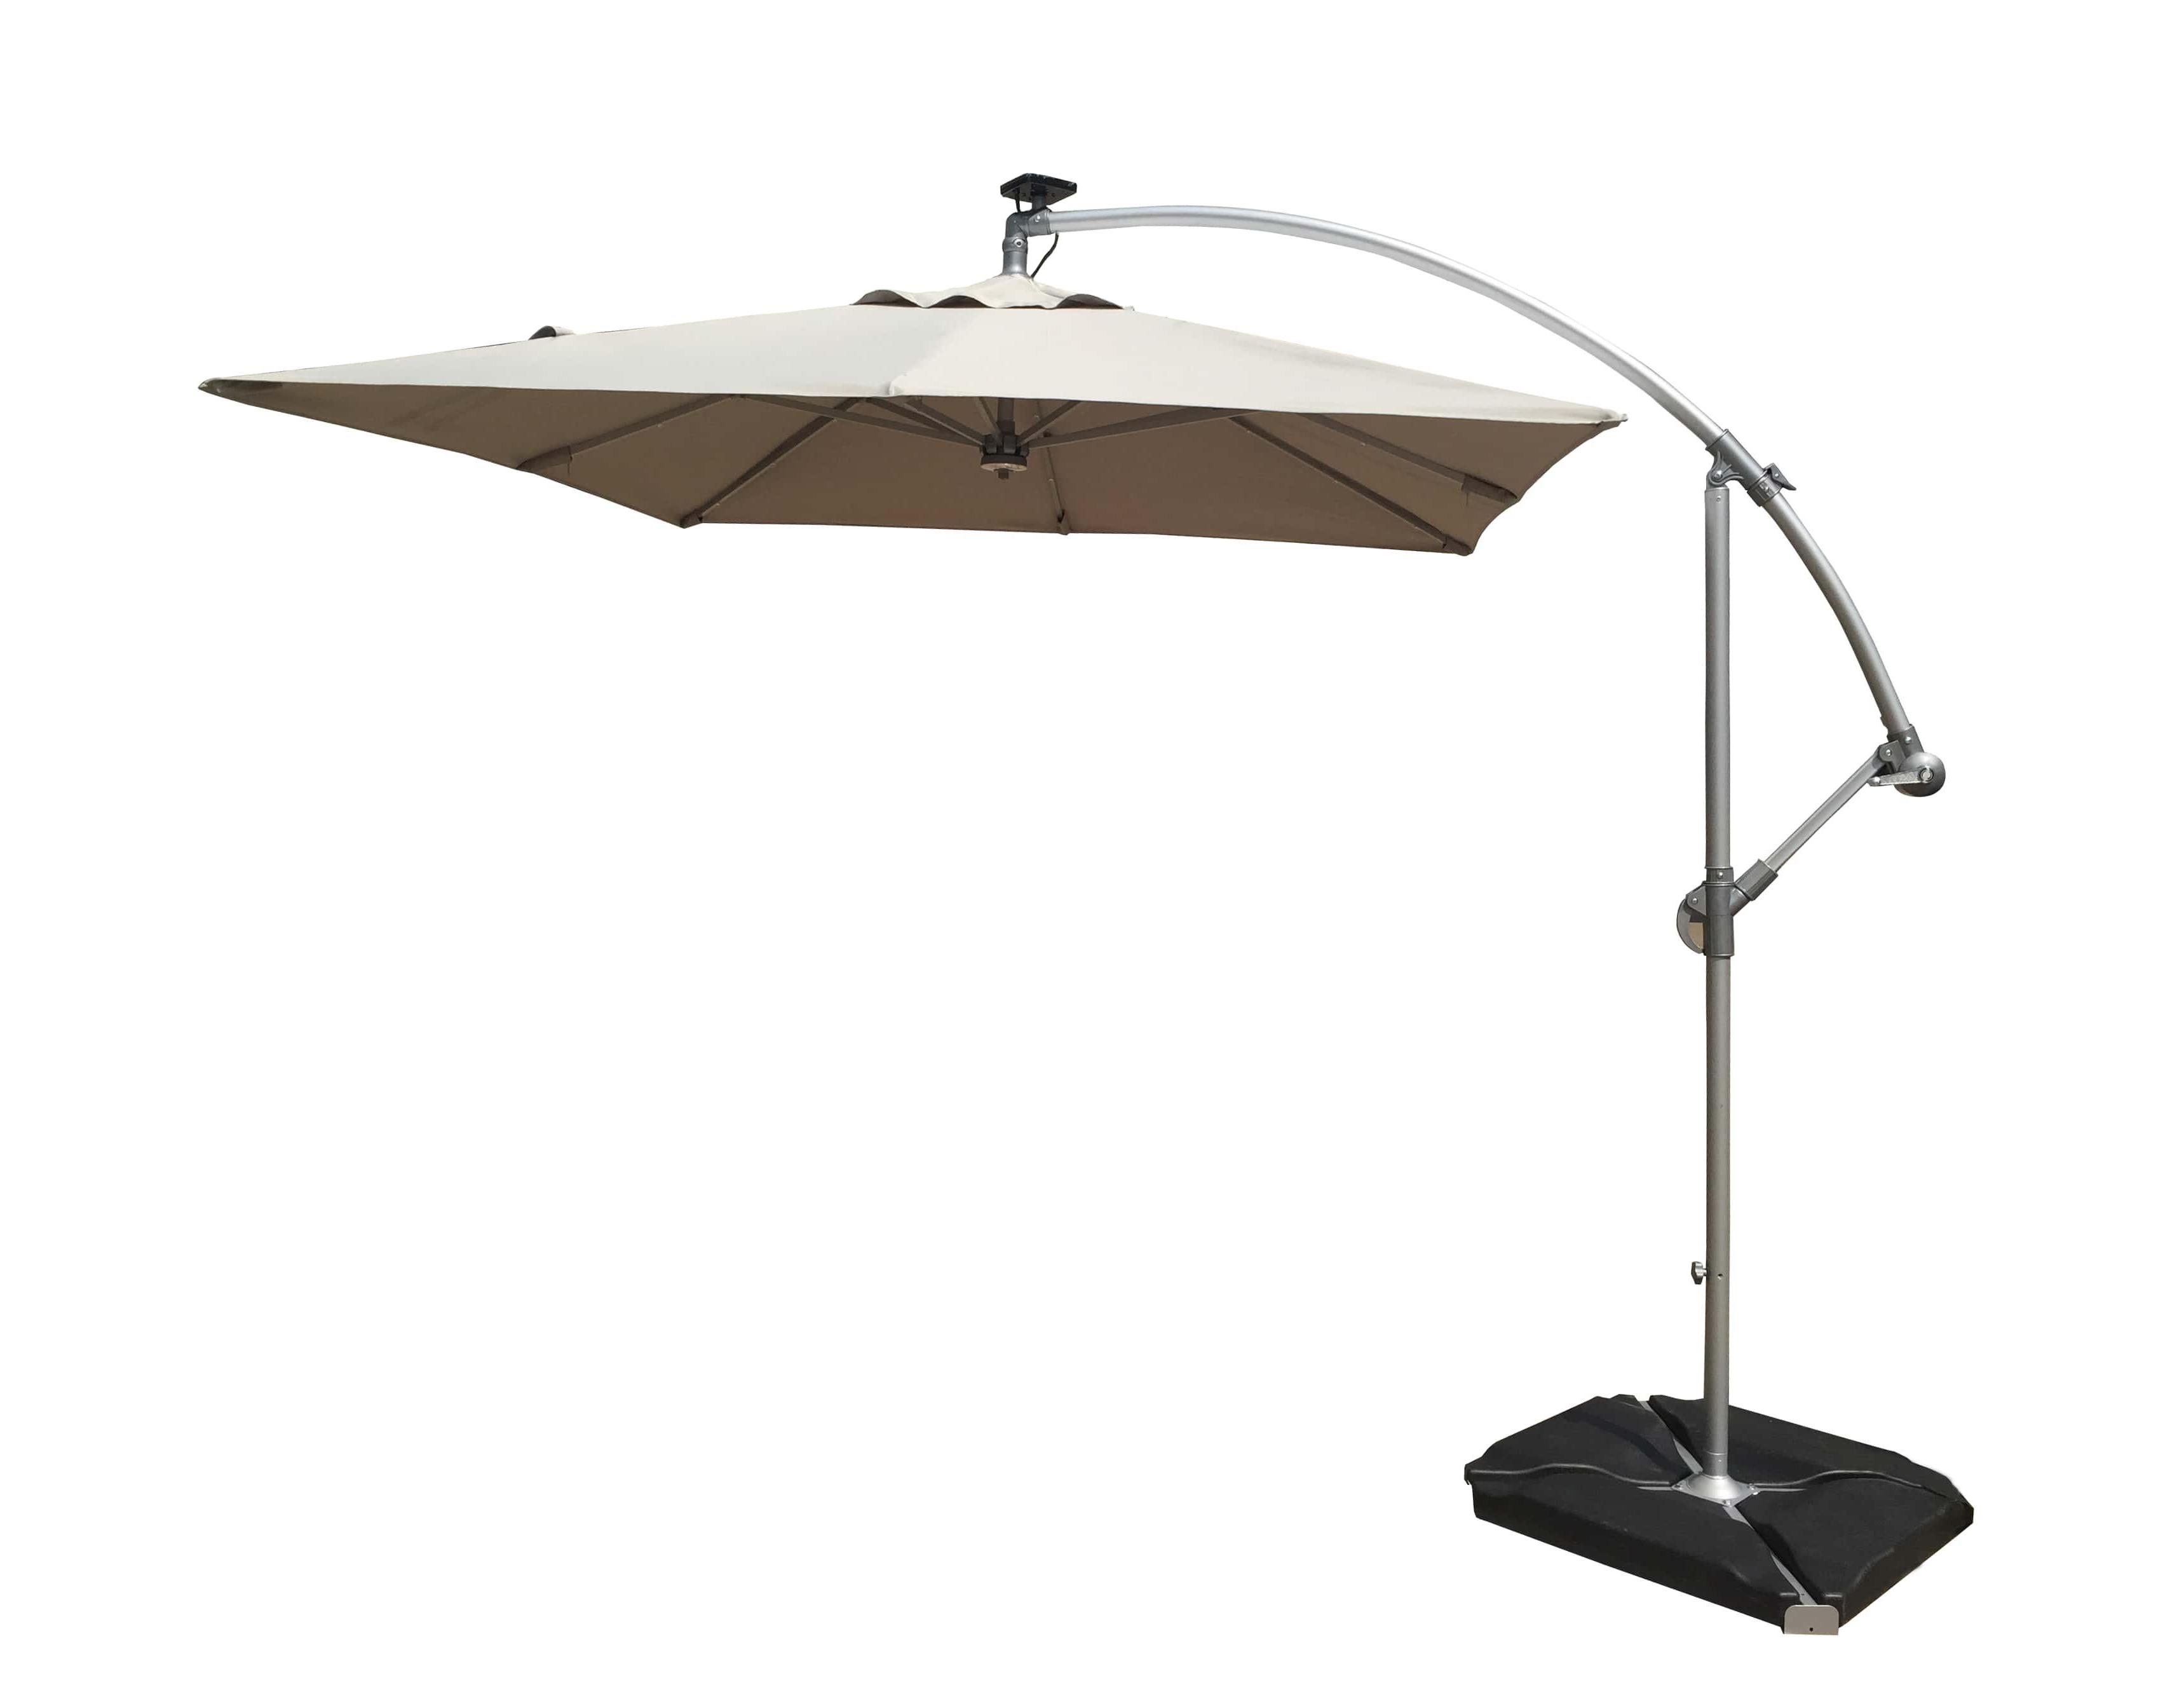 8' Cantilever Umbrella With Regard To Latest Fazeley Rectangular Cantilever Umbrellas (View 10 of 20)